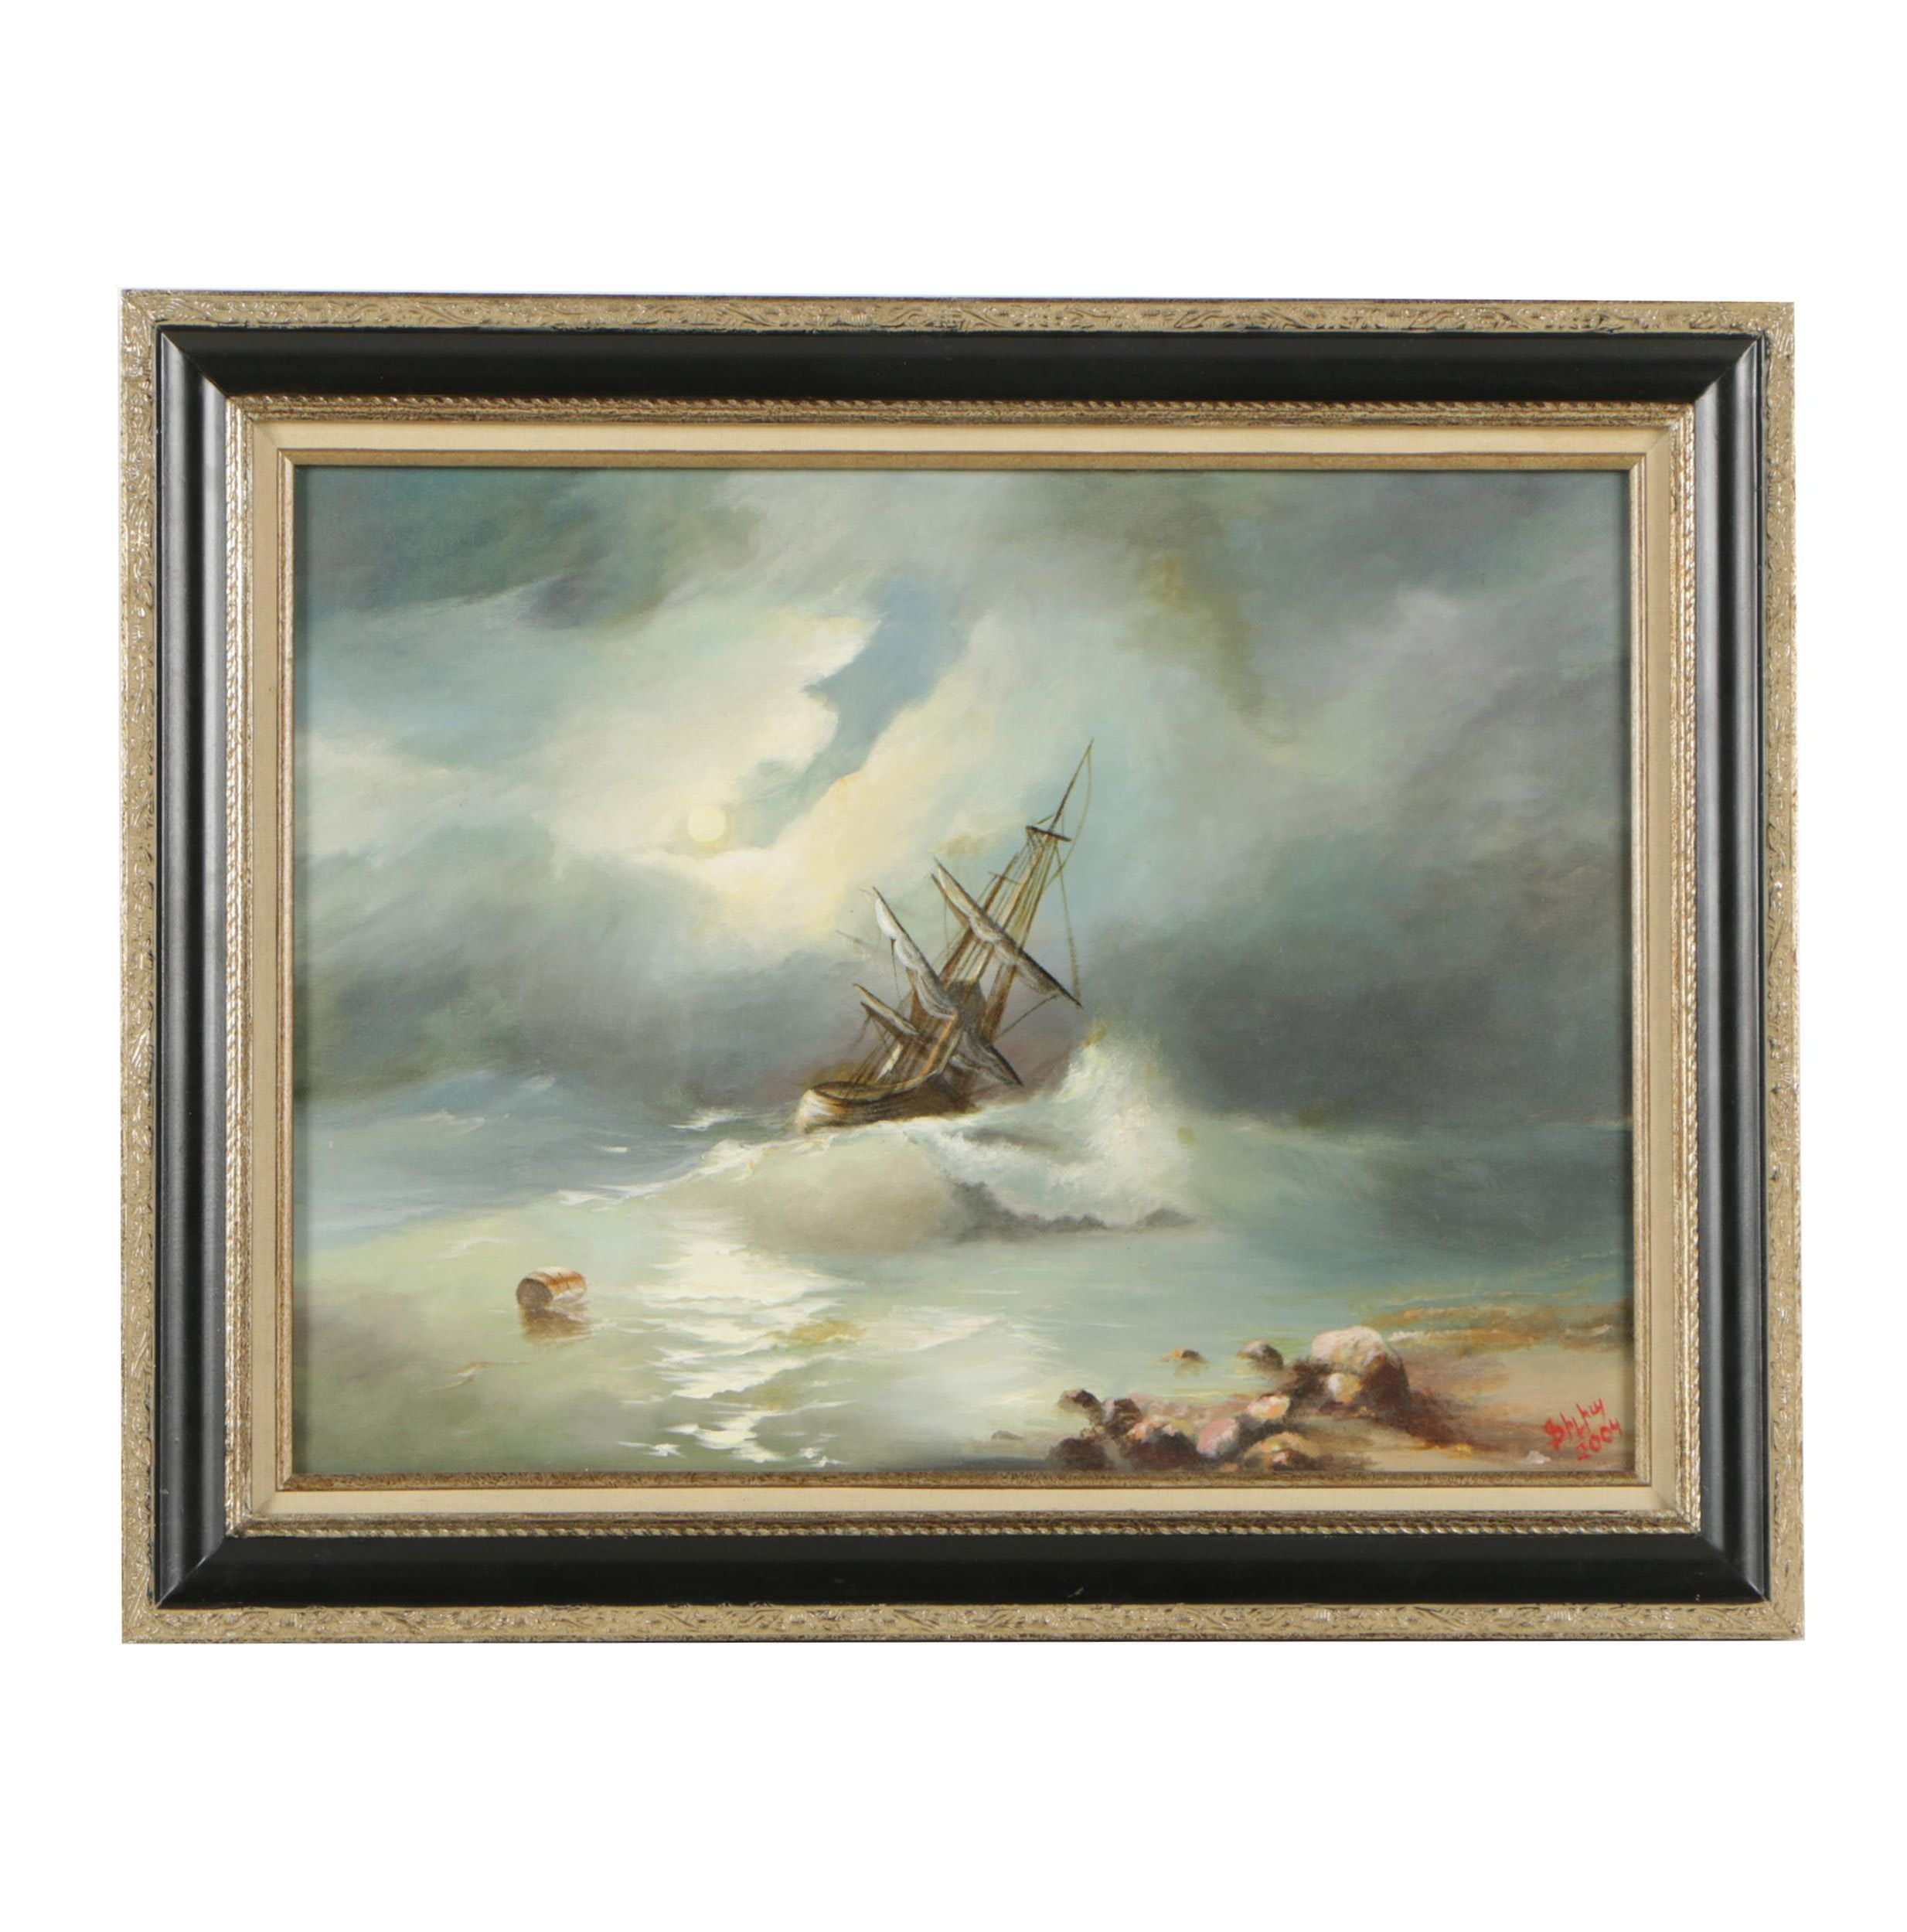 2004 Oil Painting of Boat on Choppy Seas